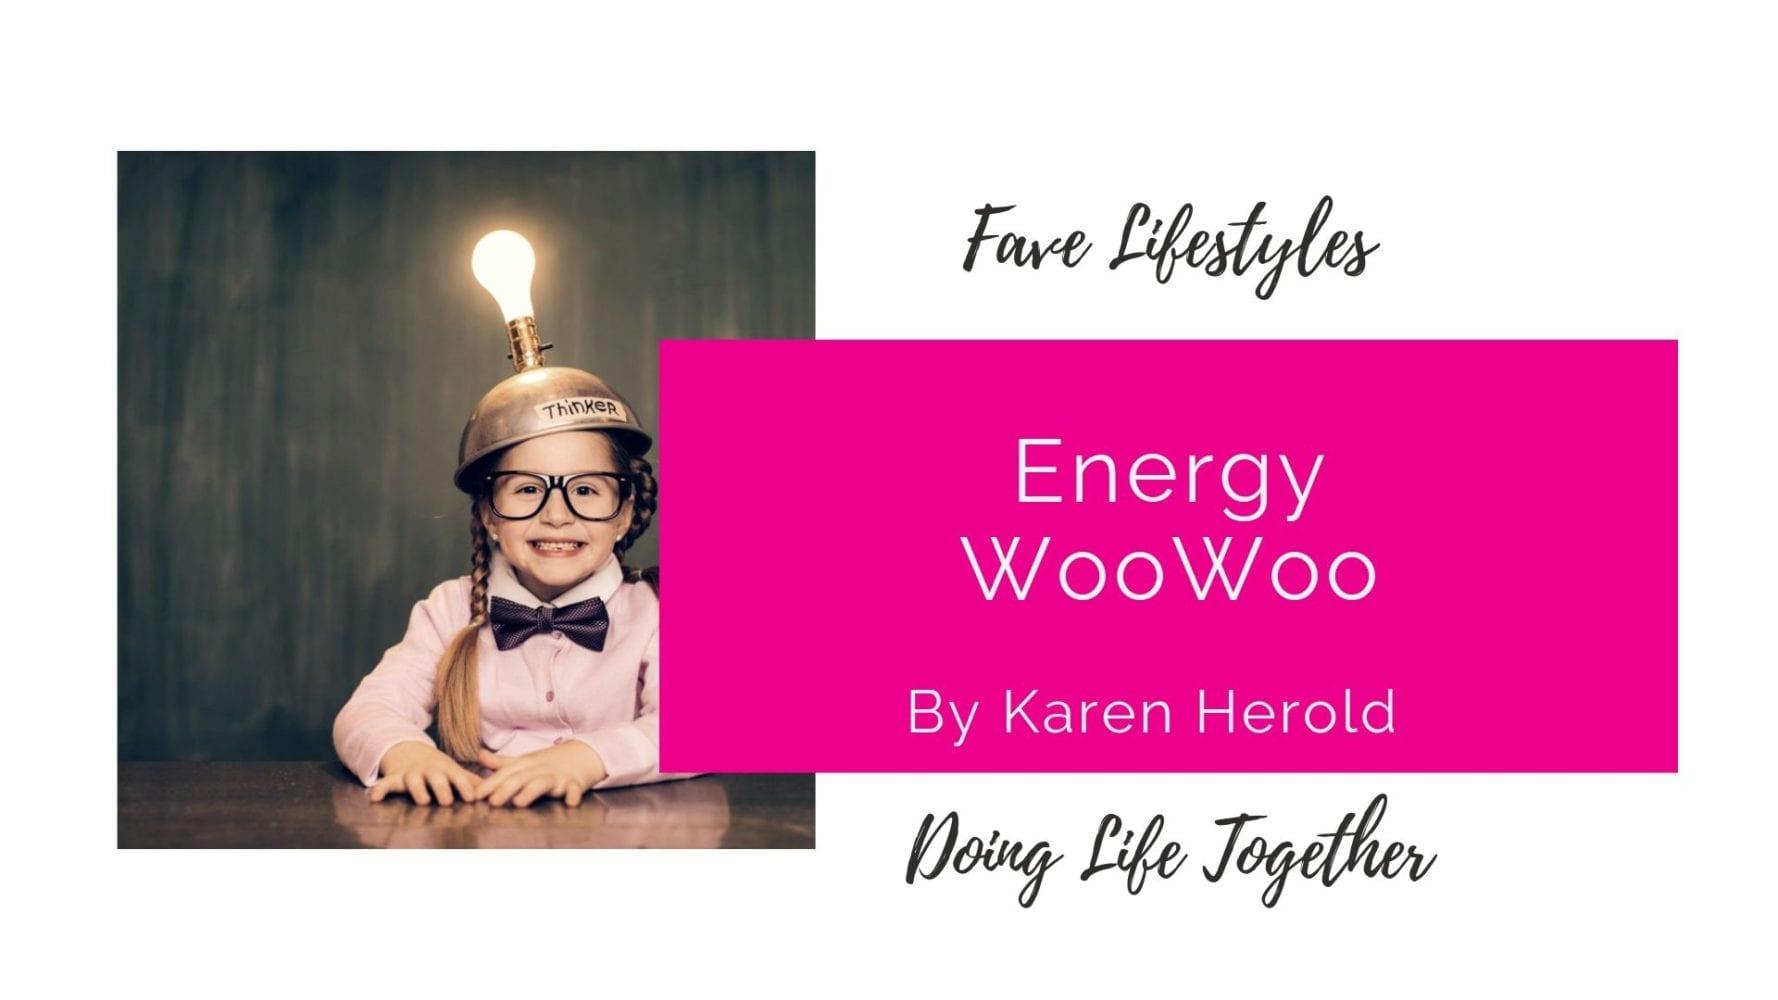 Energy WooWoo